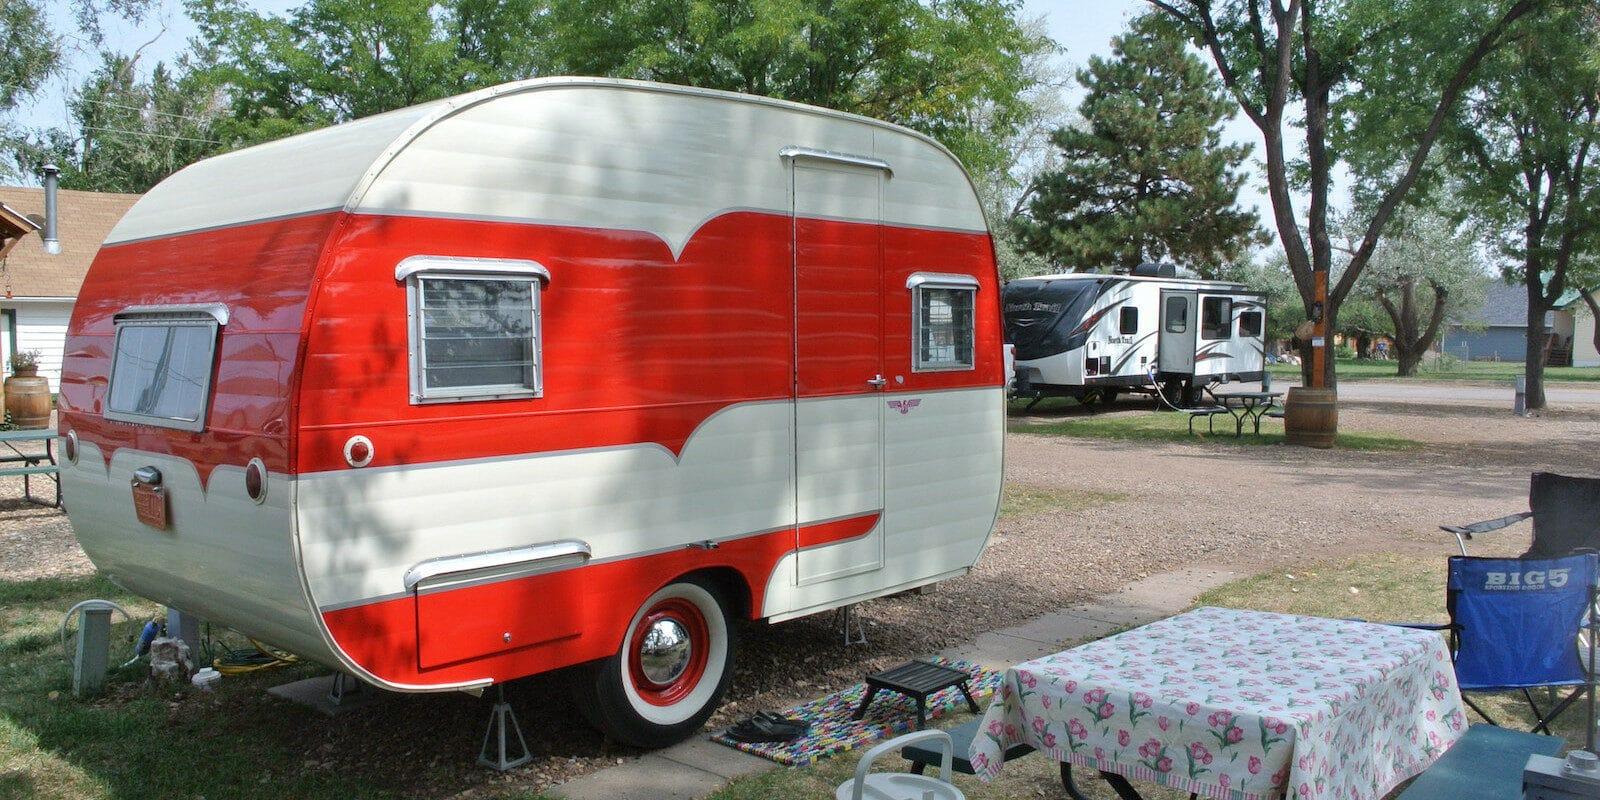 Image of a vintage red trailer